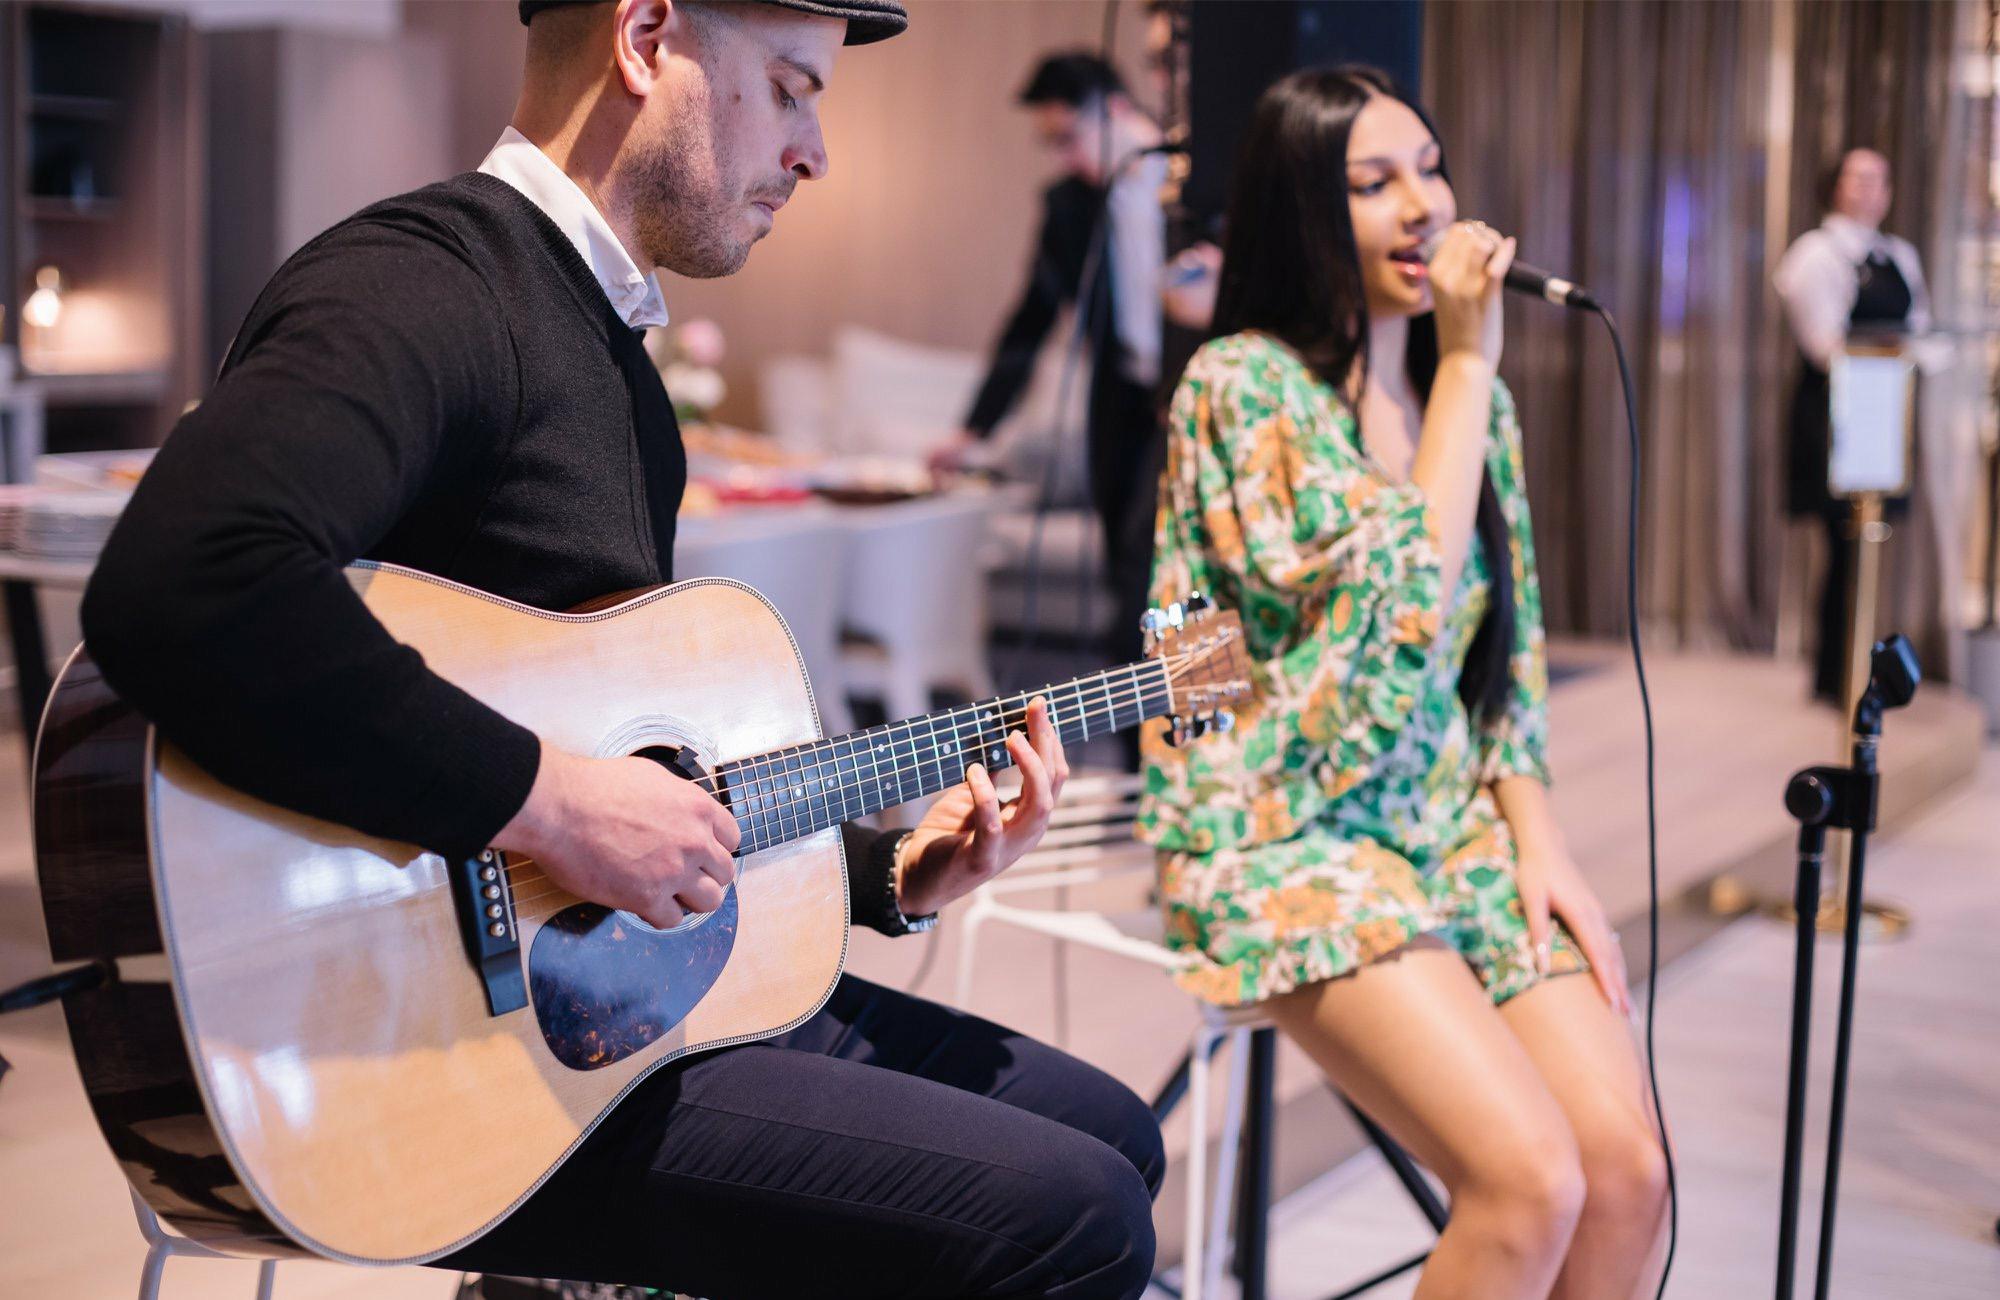 Acoustic Event wedding dj Melbourne